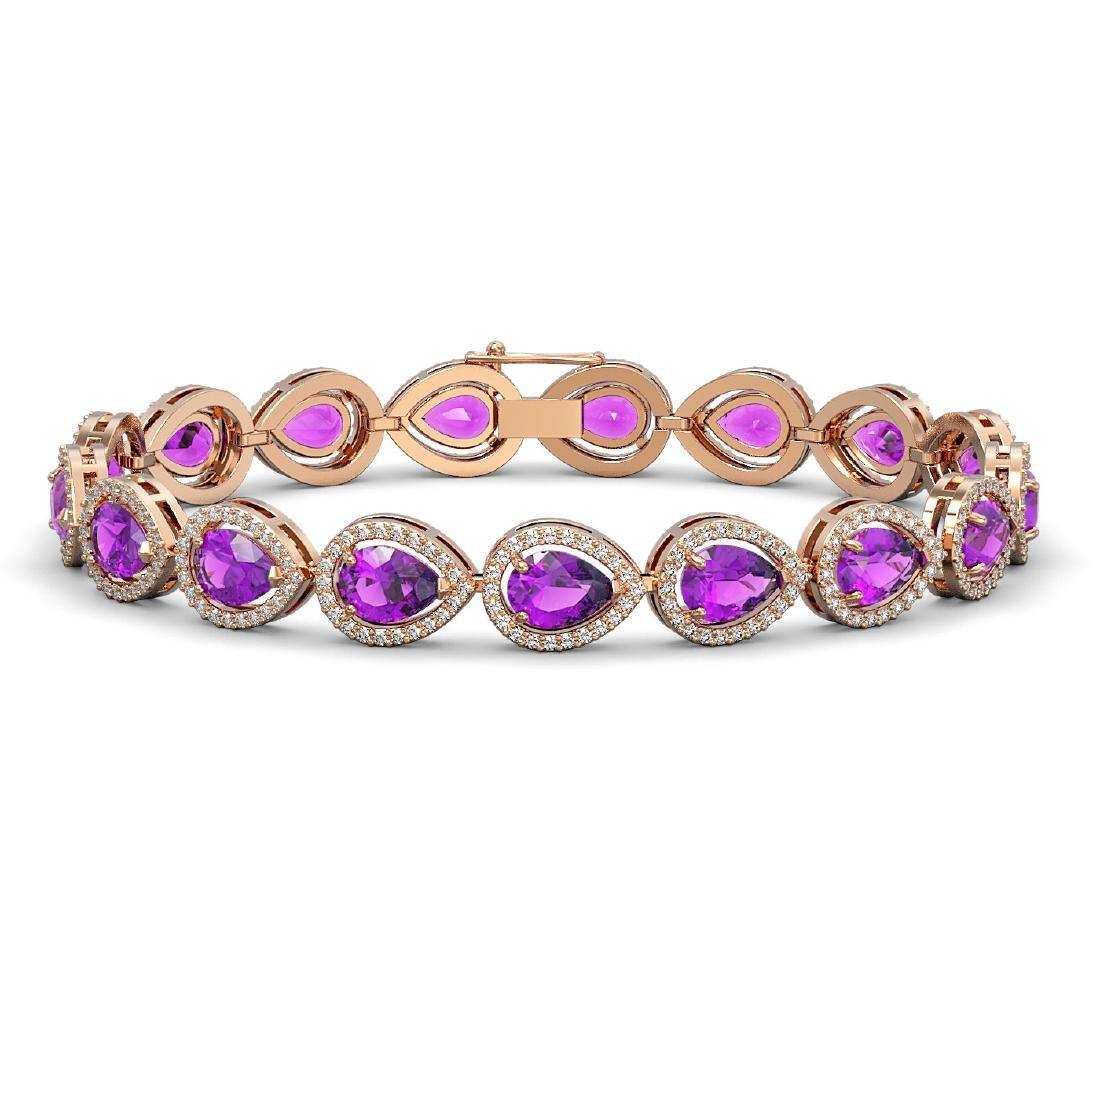 16.76 CTW Amethyst & Diamond Halo Bracelet 10K Rose